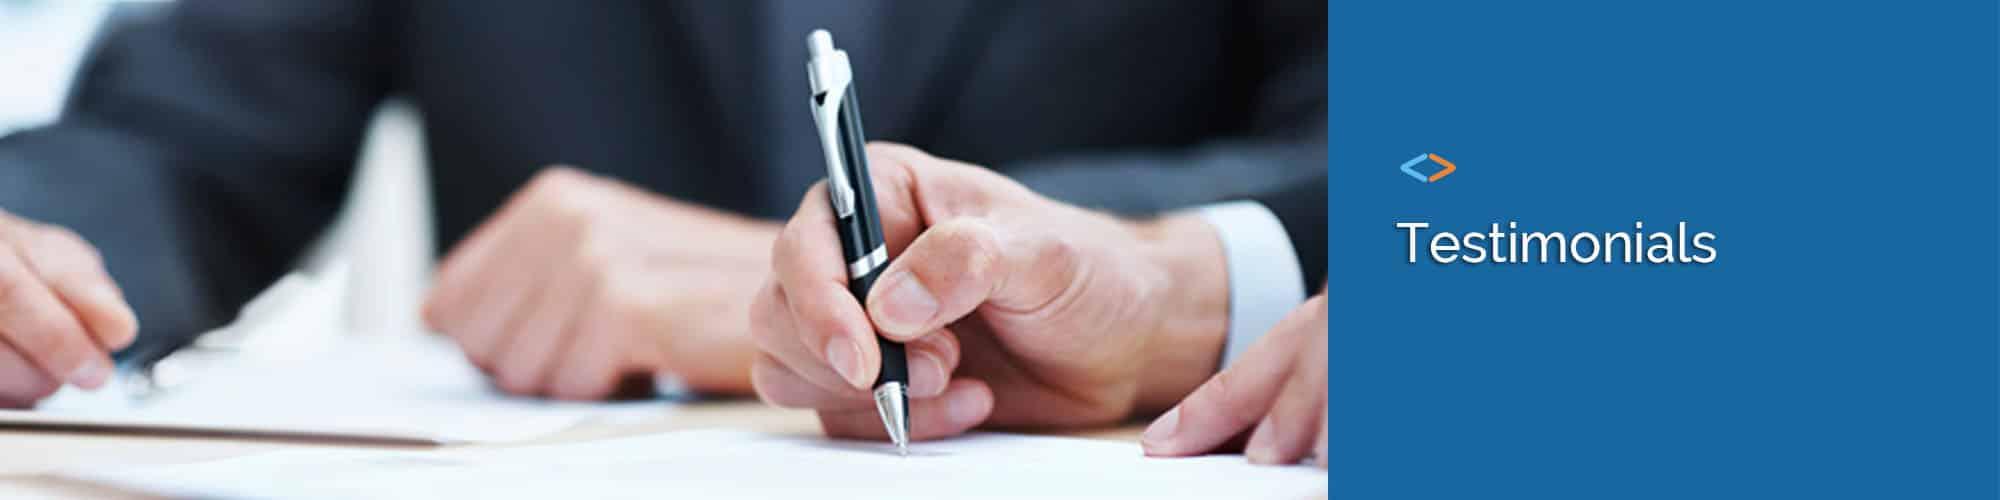 MK Brazil Accountants Testimonials